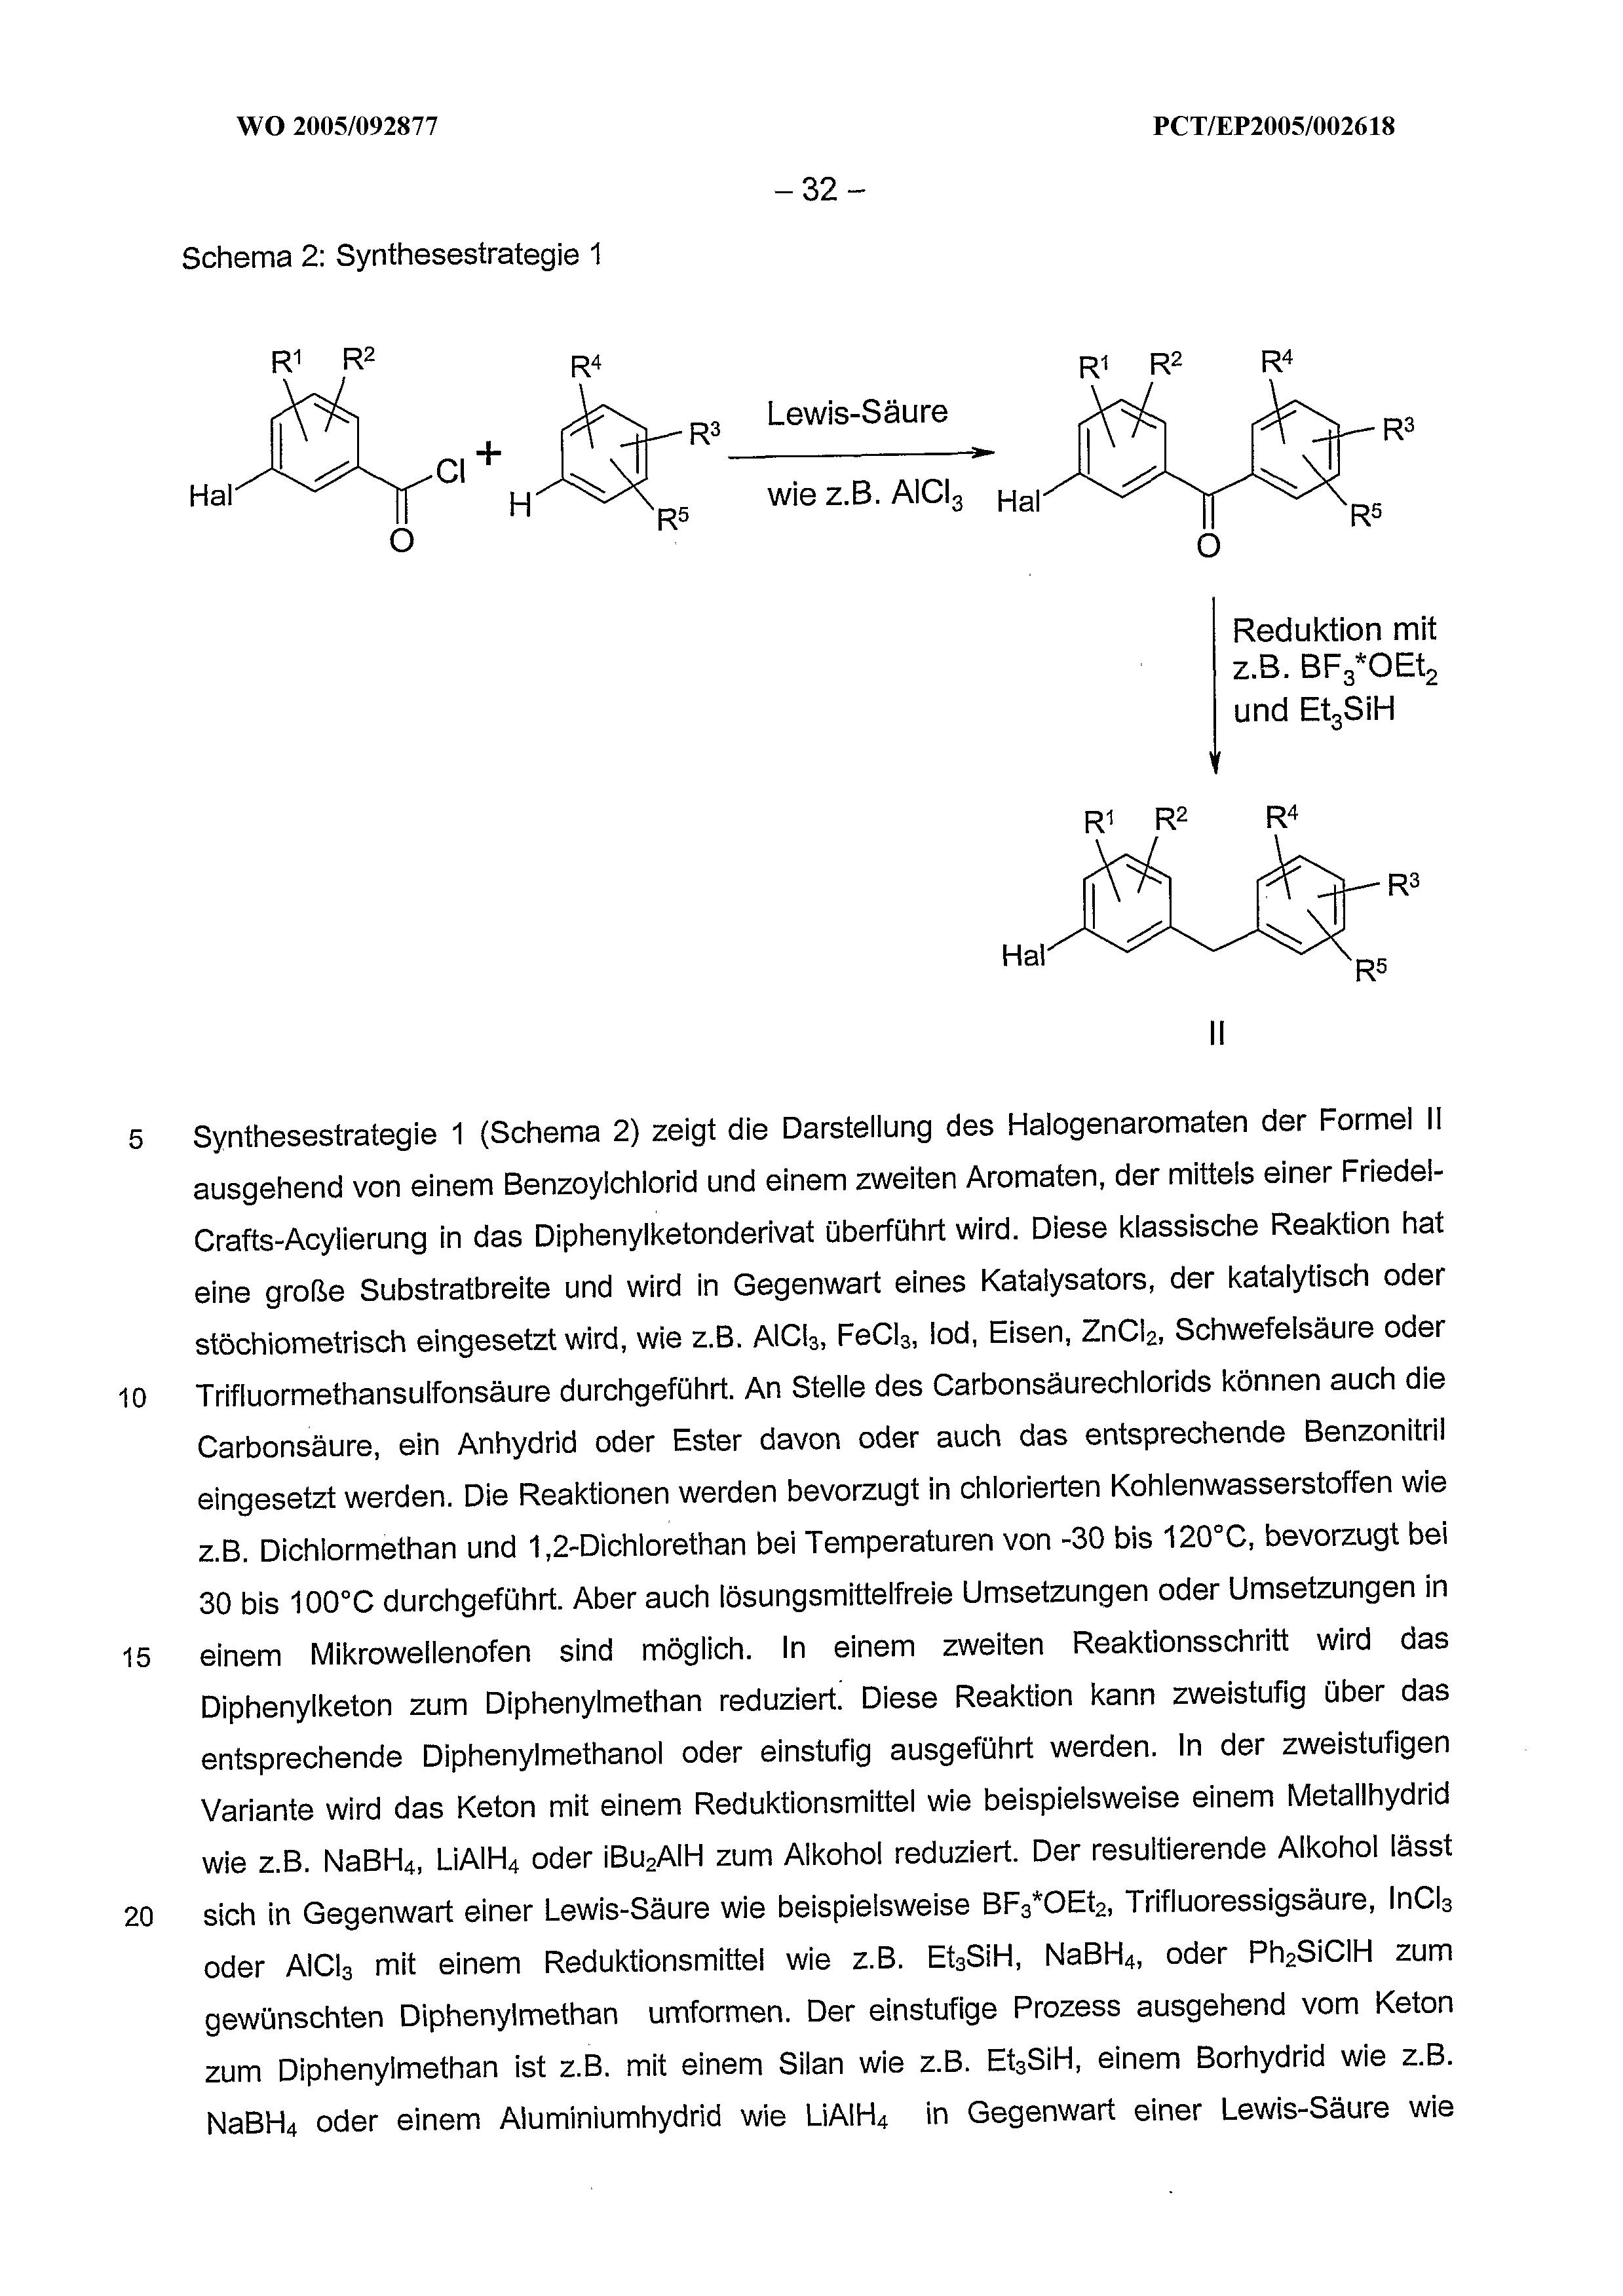 WO 2005/092877 A1 - Glucopyranosyl-substituted Benzol Derivatives ...